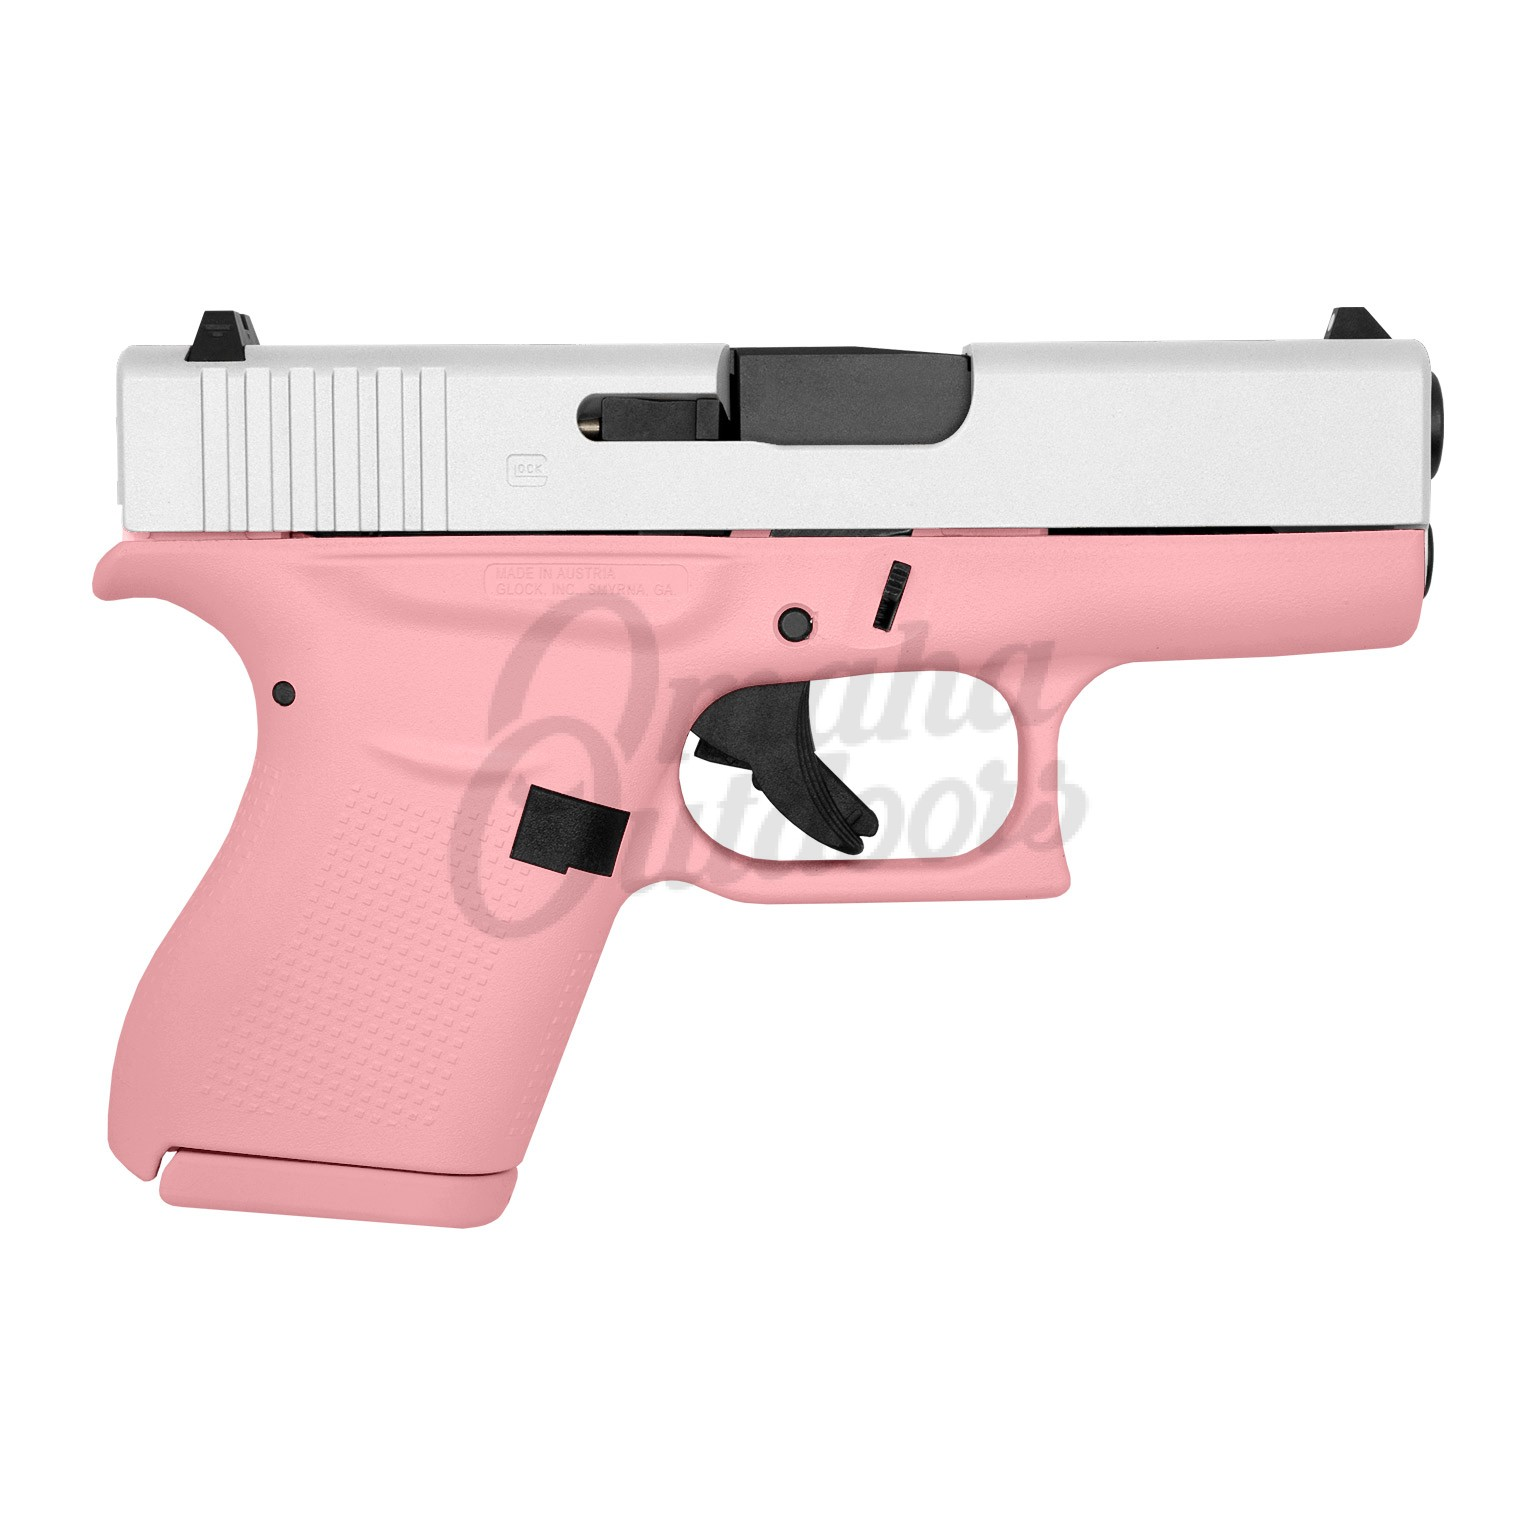 glock 43 victoria pink pistol 9mm satin aluminum slide 6 rd